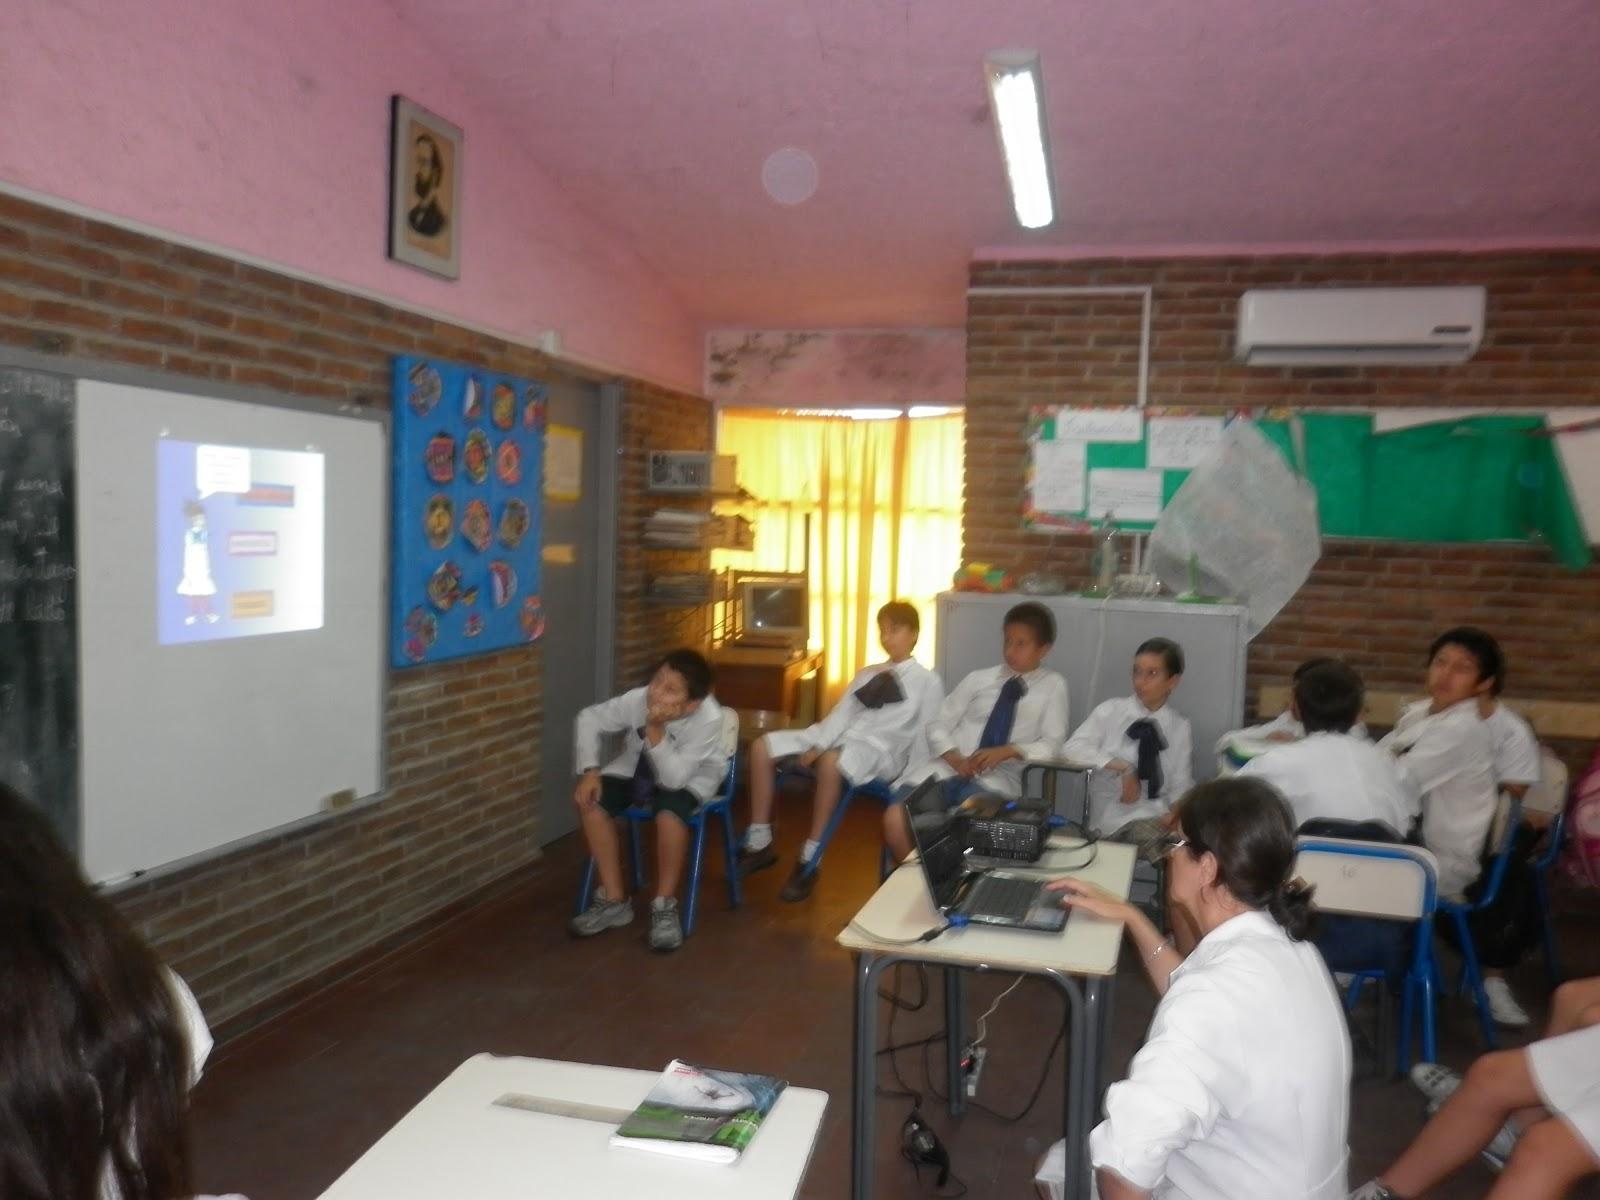 http://1107031.esc.fls.crea.ceibal.edu.uy/sitio/